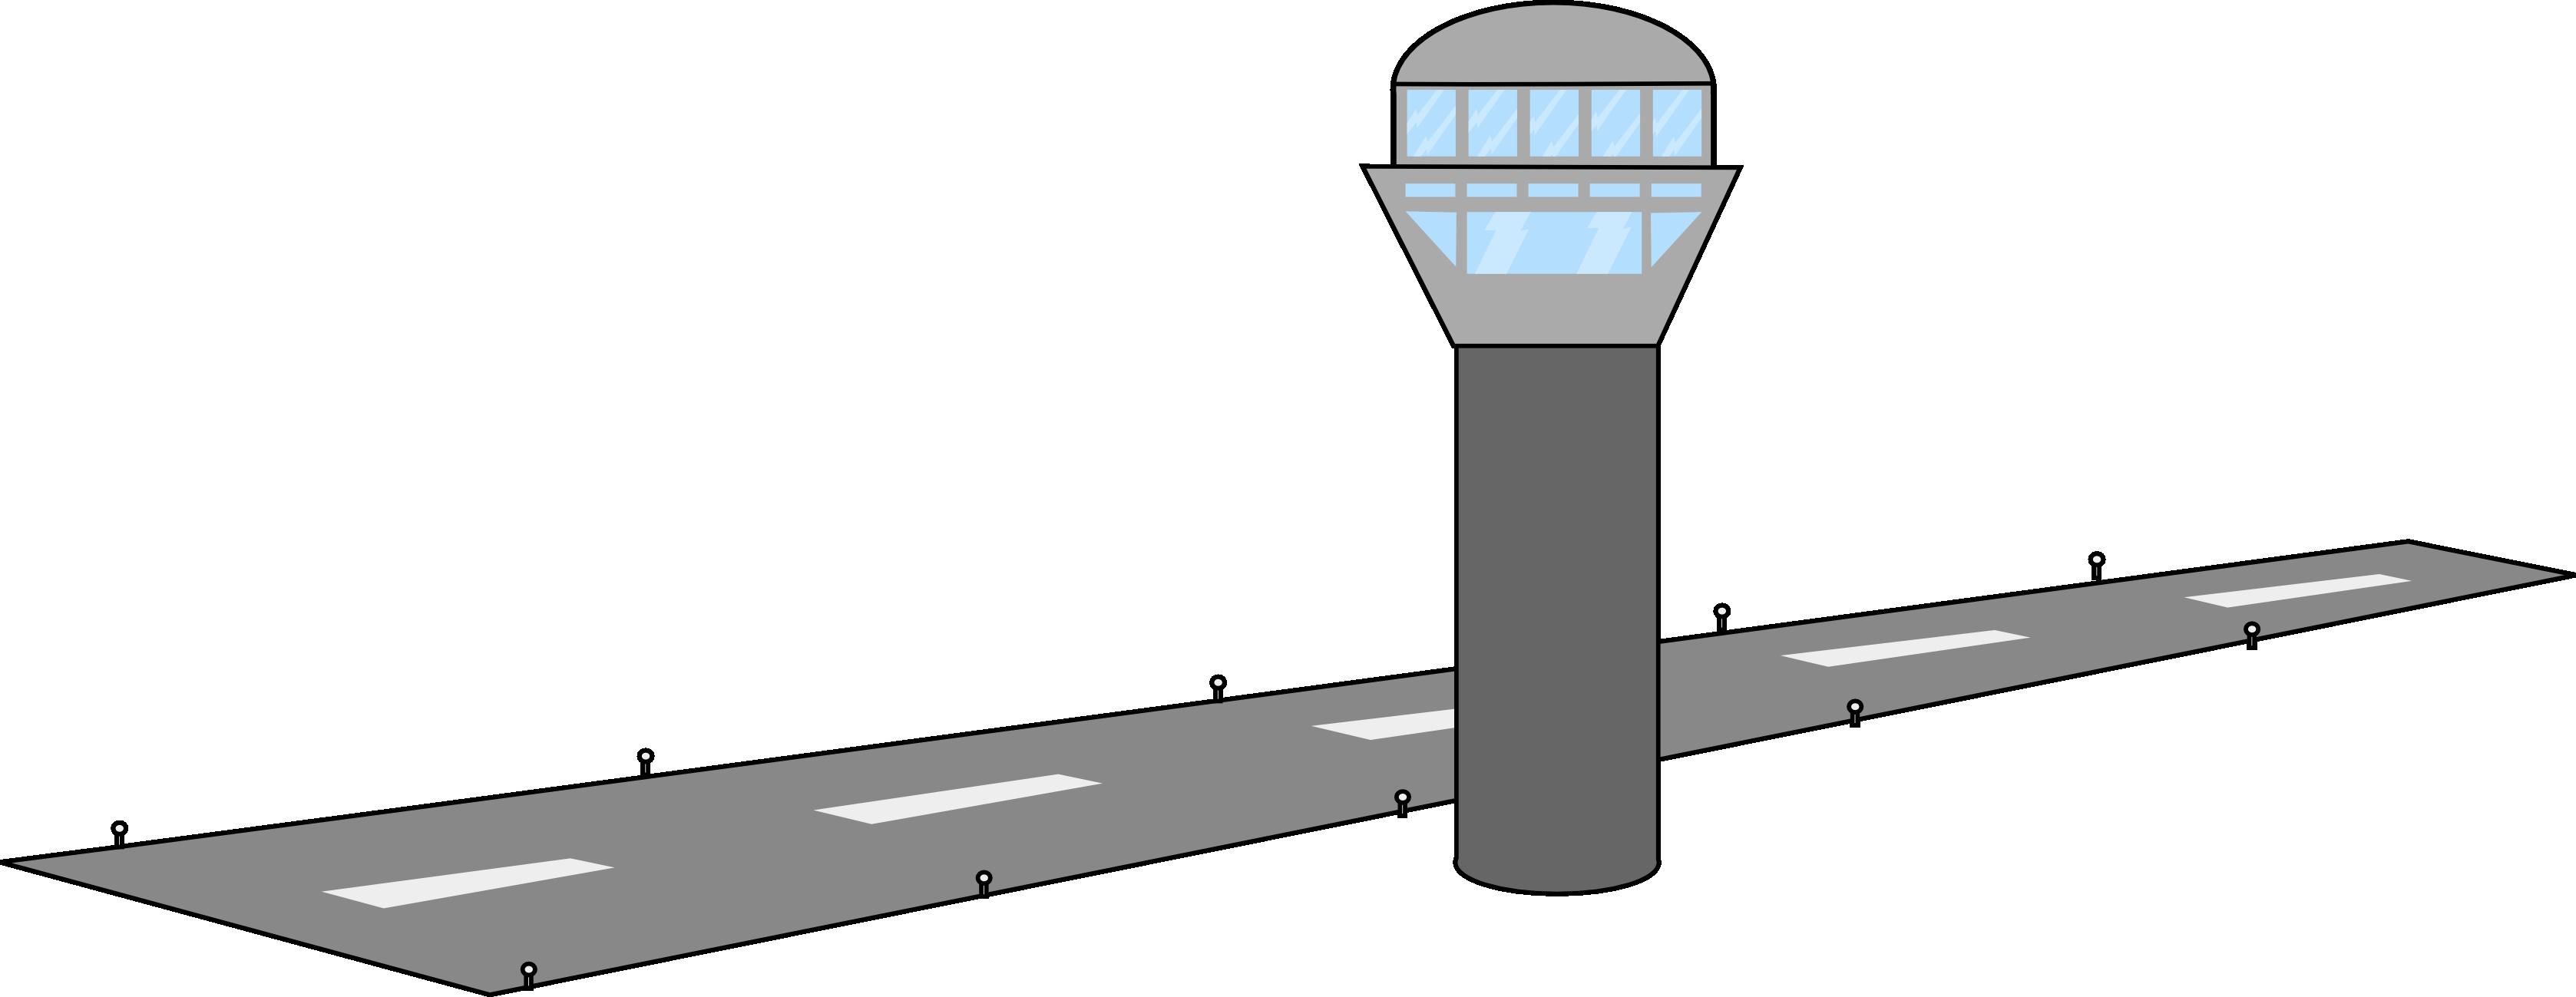 Free Runway Cliparts, Download Free Clip Art, Free Clip Art.